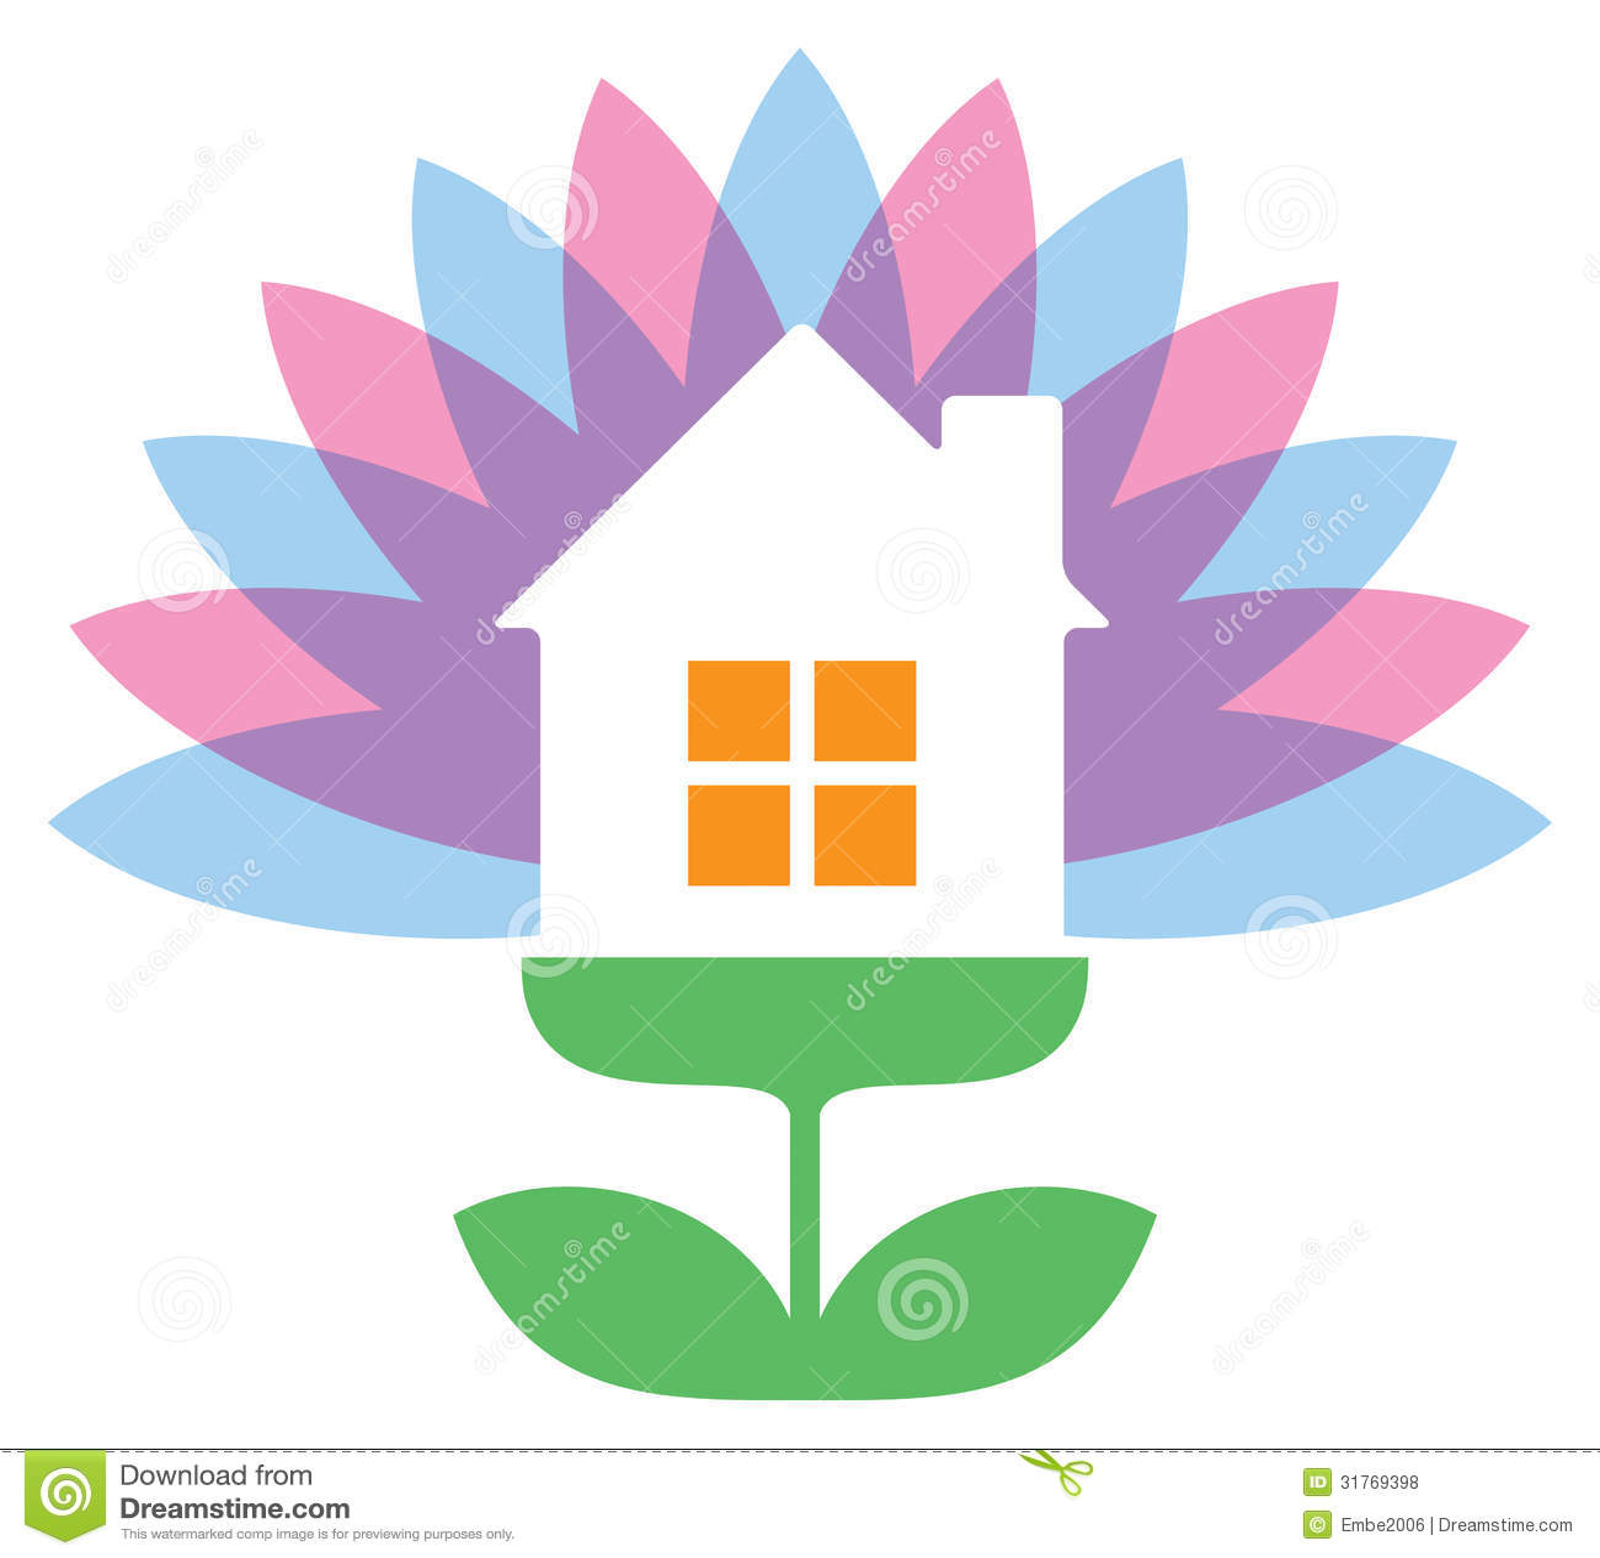 Flower house logo royalty free stock photos image 31769398 for House logo design free